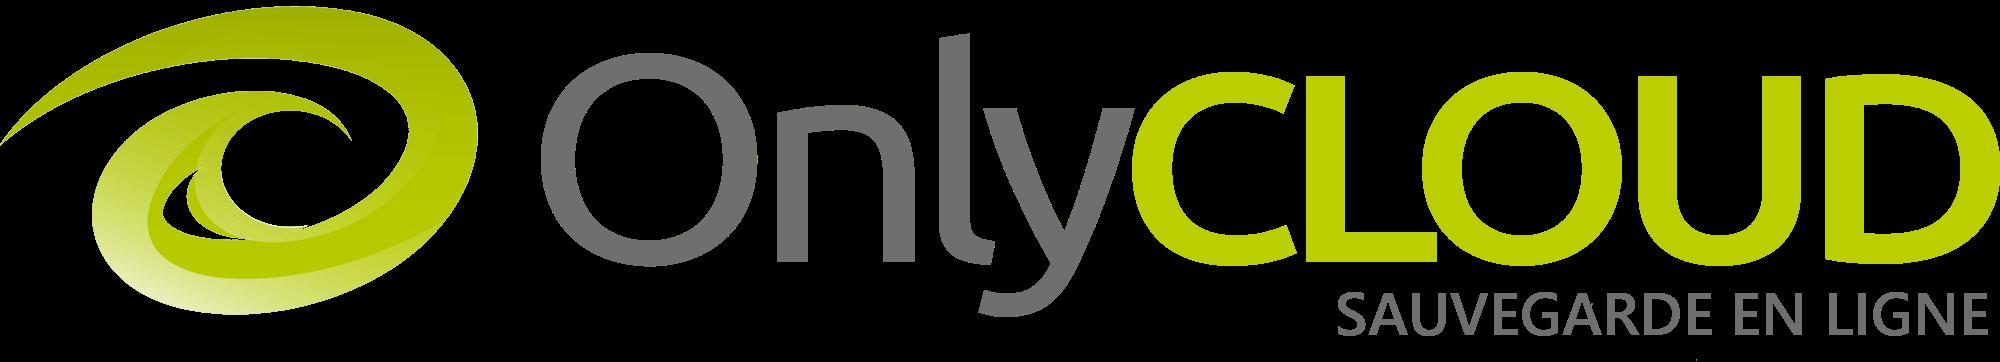 Onlycloud Backup - Sauvegarde en ligne